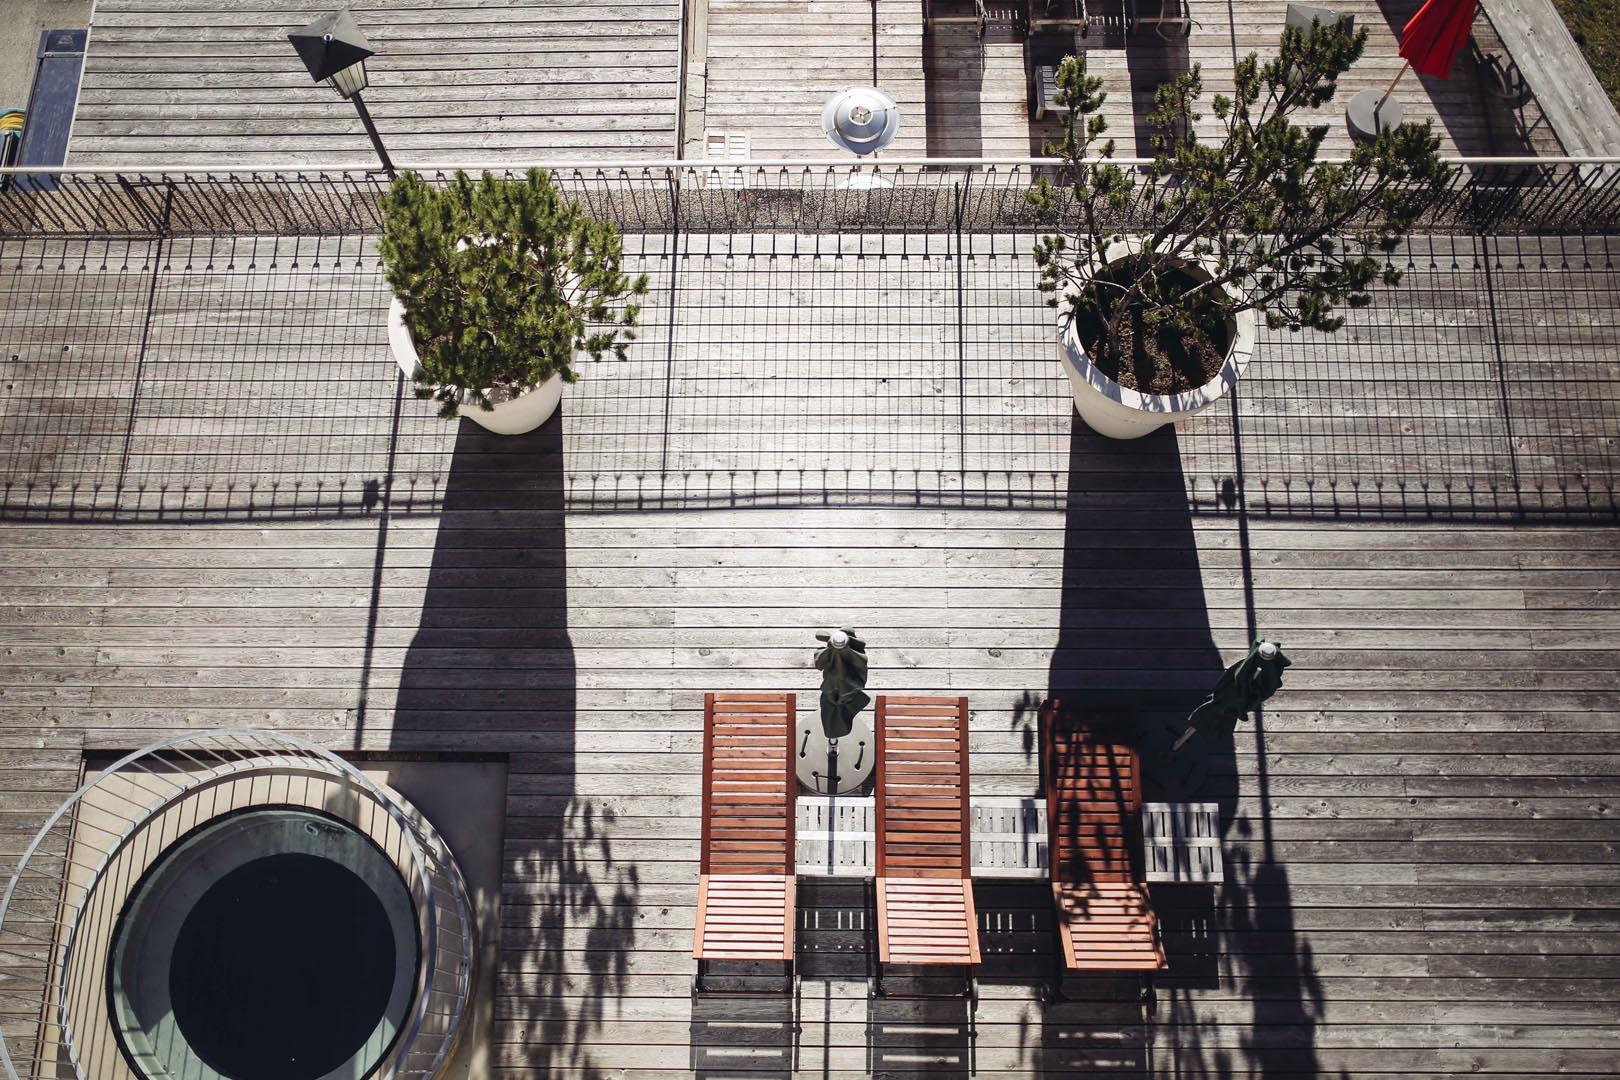 designhotel-miramonte-bad-gastein-outside-charlotte-stoffels-4.jpg